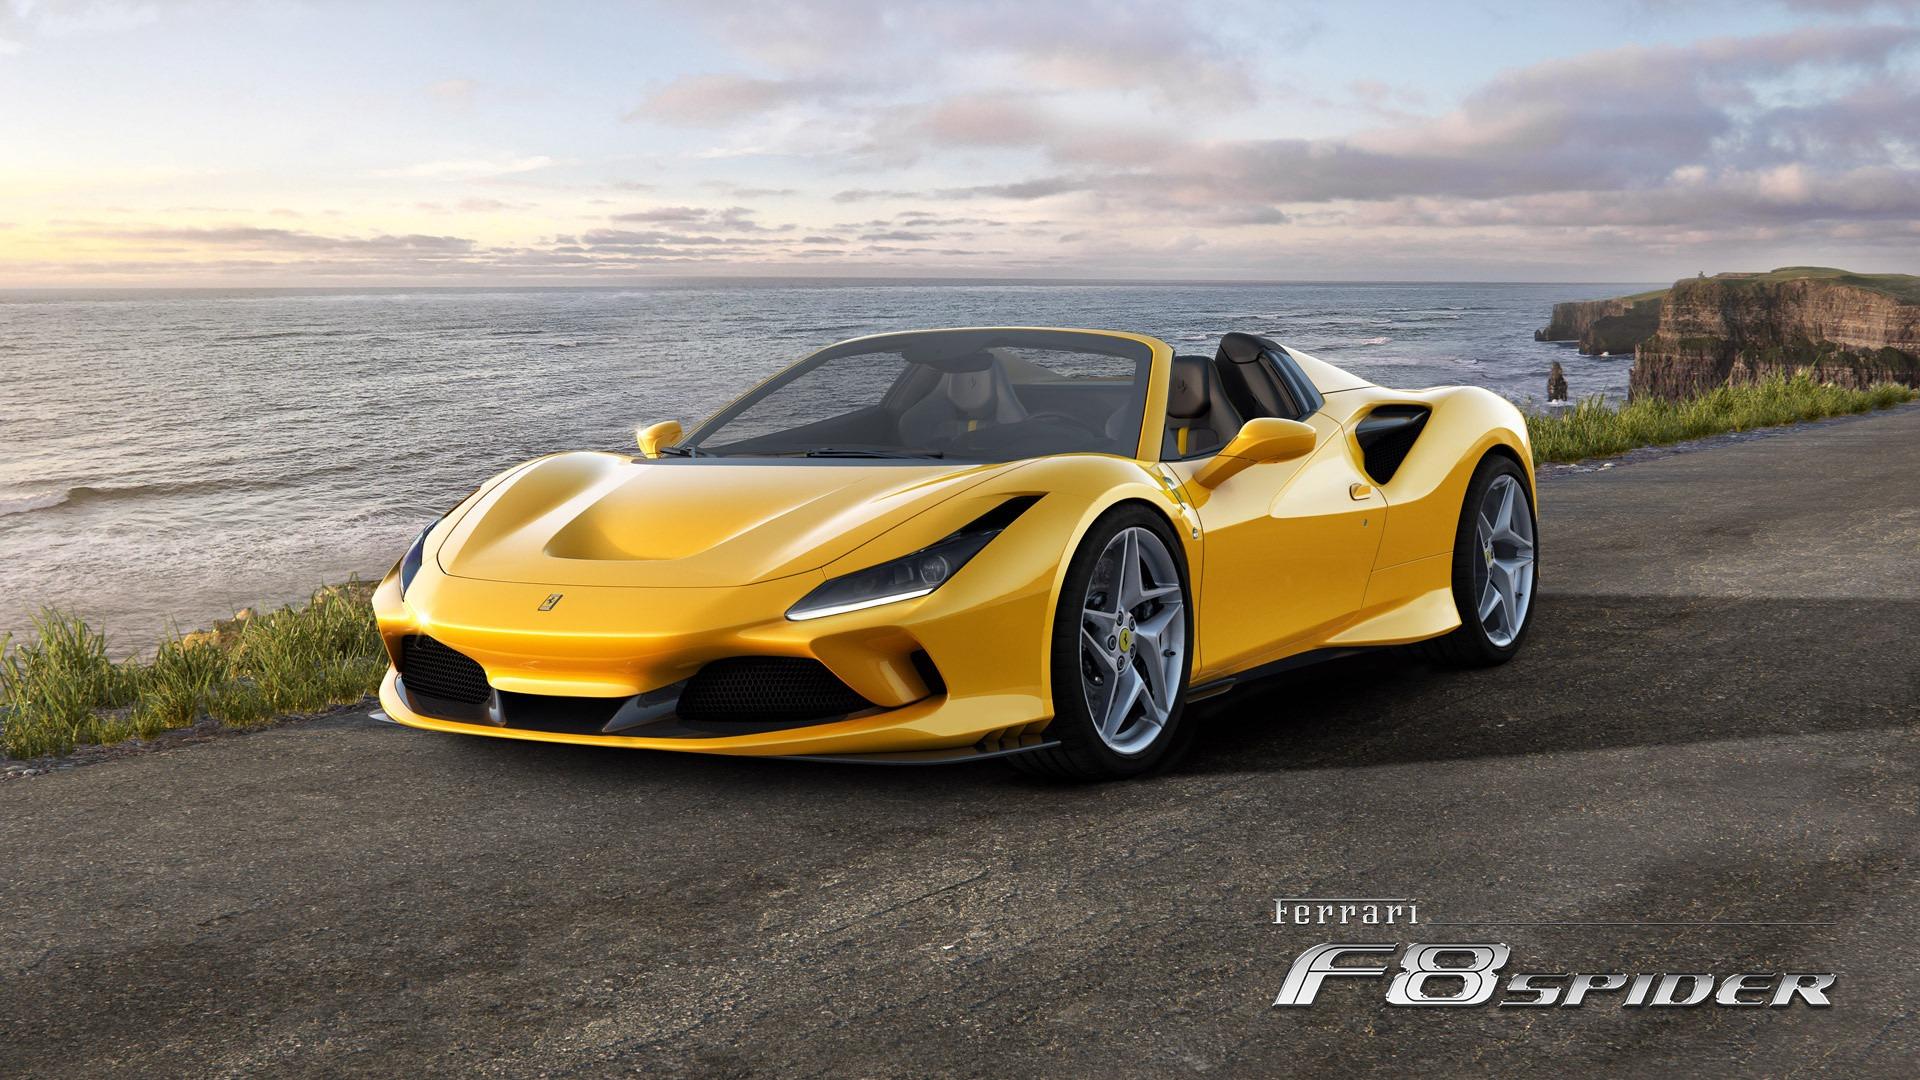 New 2021 Ferrari F8 Spider for sale Sold at Aston Martin of Greenwich in Greenwich CT 06830 1